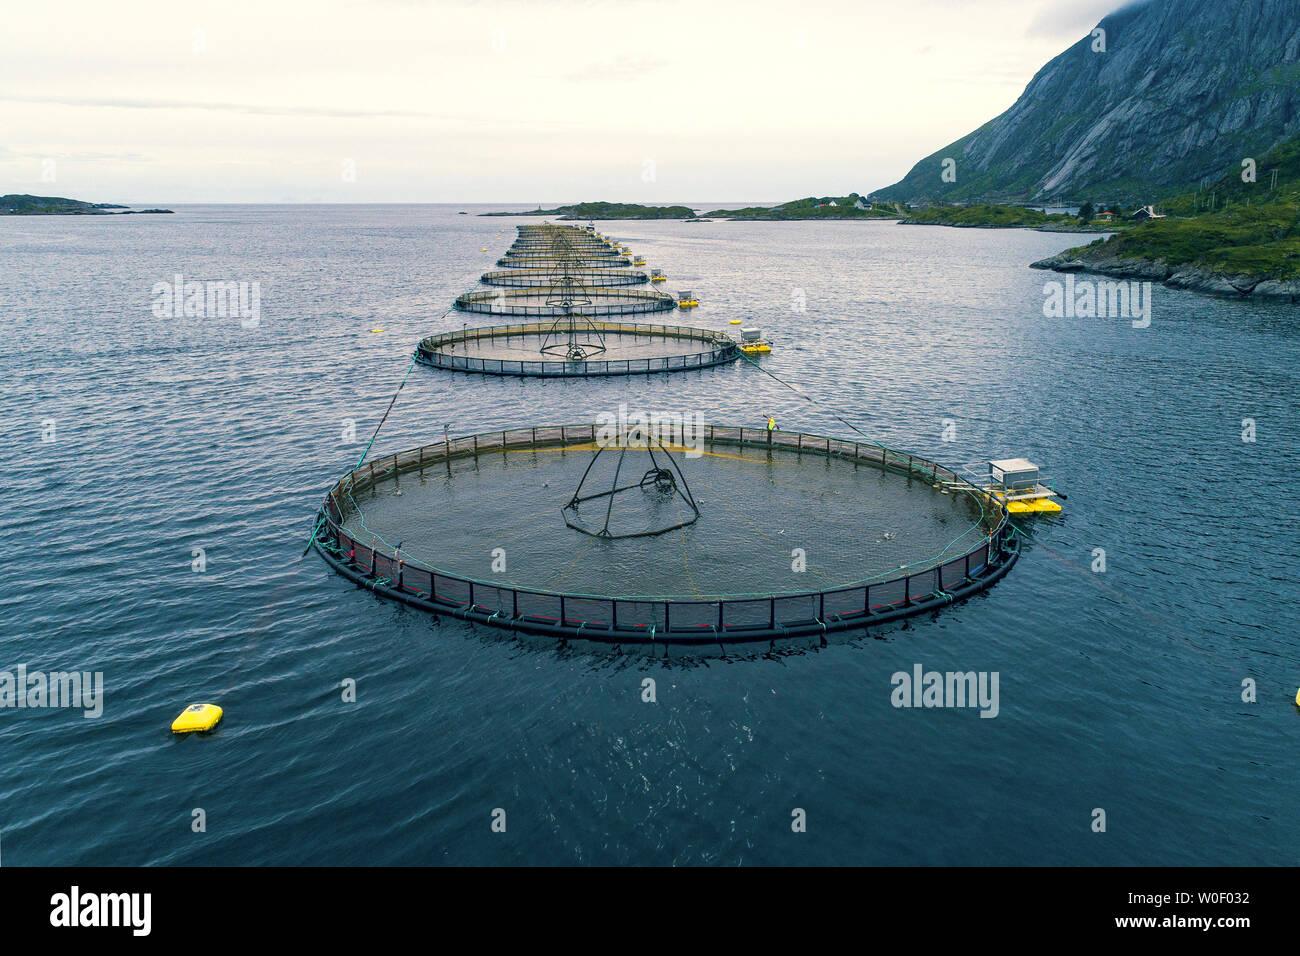 Norway, Lofoten Islands. Mølnarodden Salmon fishery - Stock Image